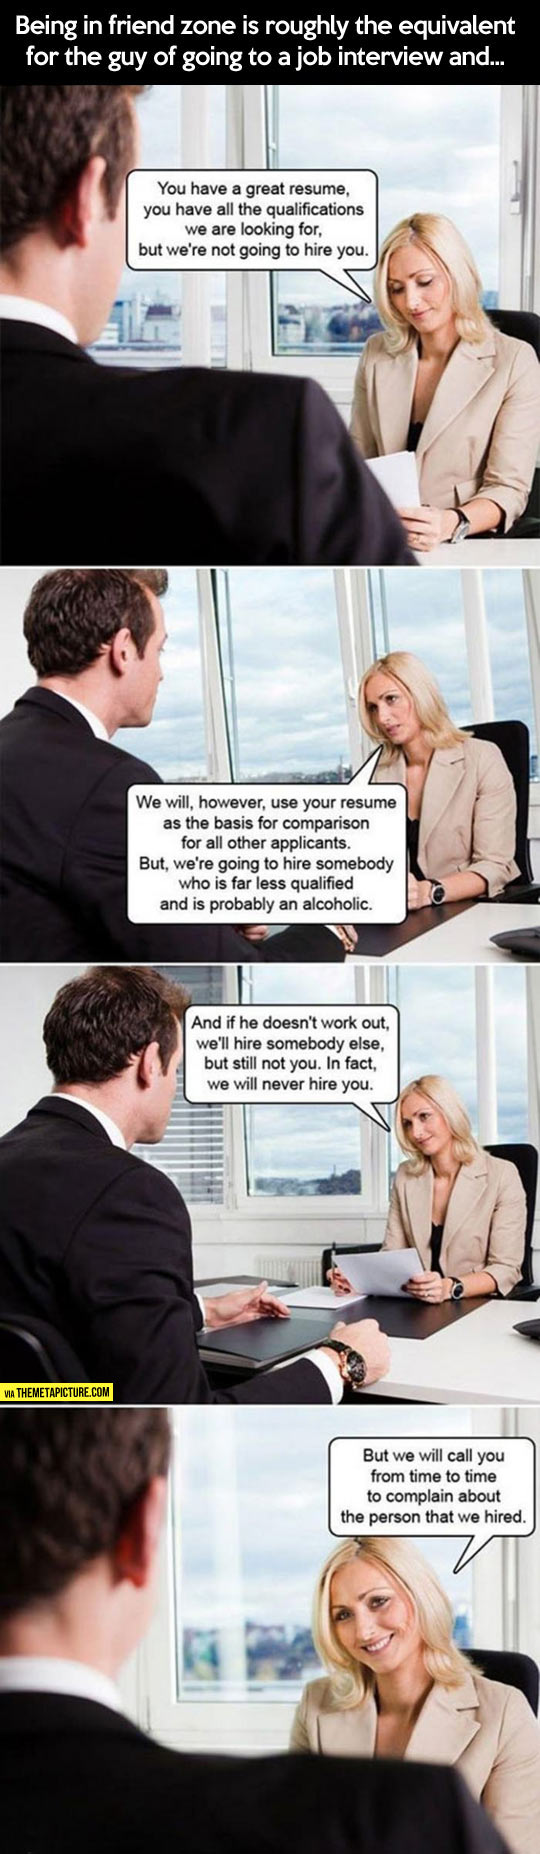 The Friendzone Explained Professionally